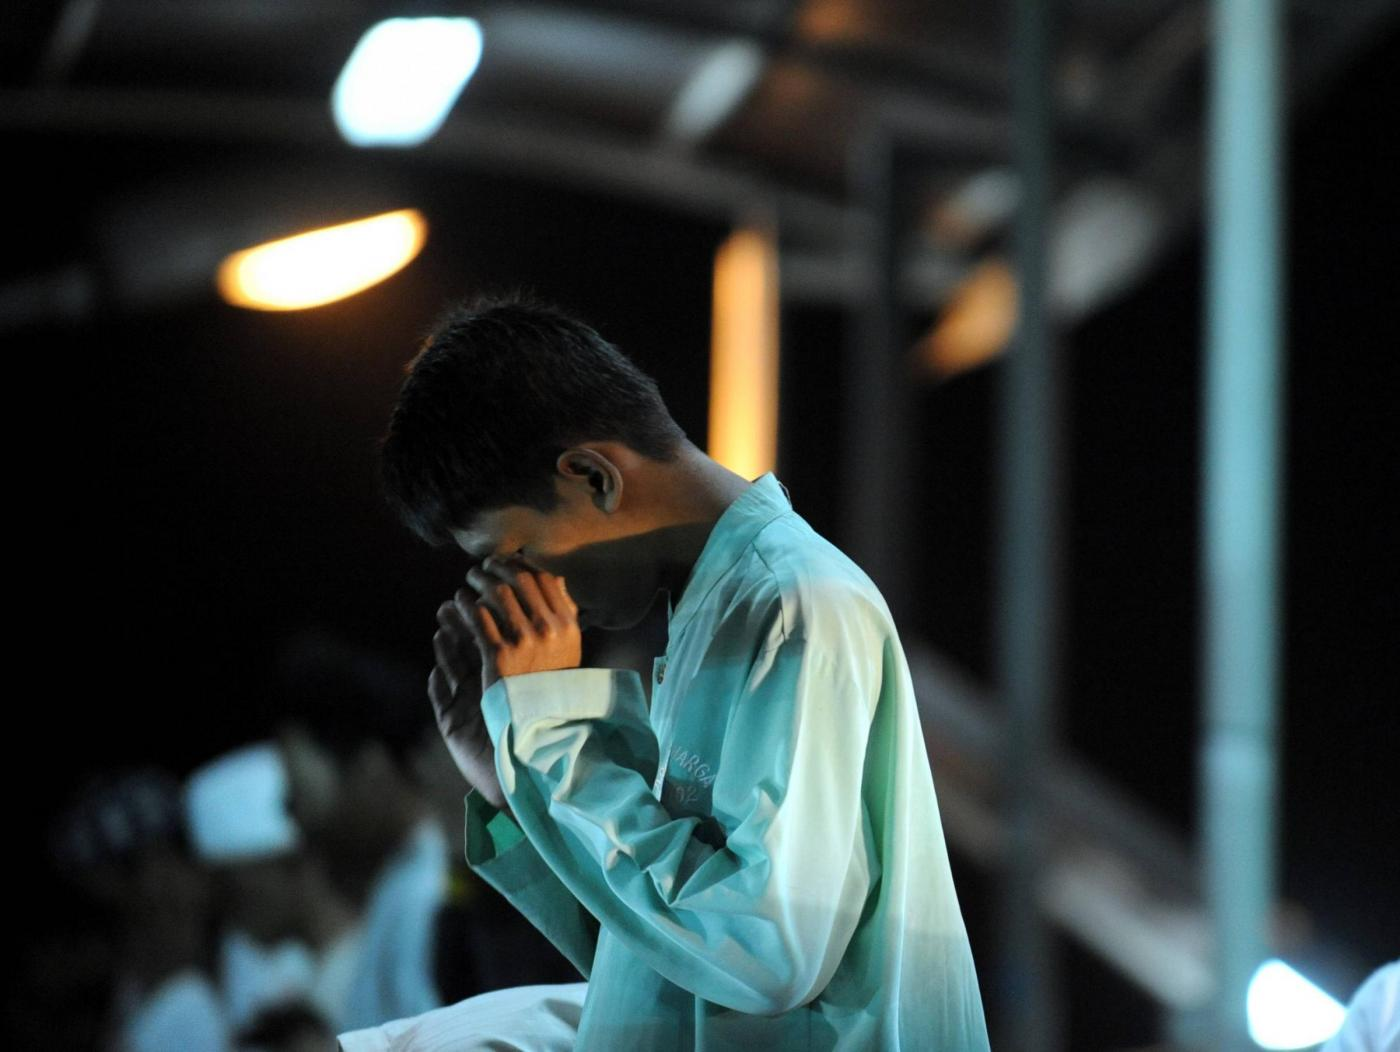 "(150617) -- JAKARTA, June 17, 2015 (Xinhua) -- An Indonesian muslim performs an evening prayer called ""tarawih"", marking the first eve of Ramadan at a street in Jakarta, Indonesia, June 17, 2015. (Xinhua/Agung Kuncahya B.)  ****Authorized by ytfs****"